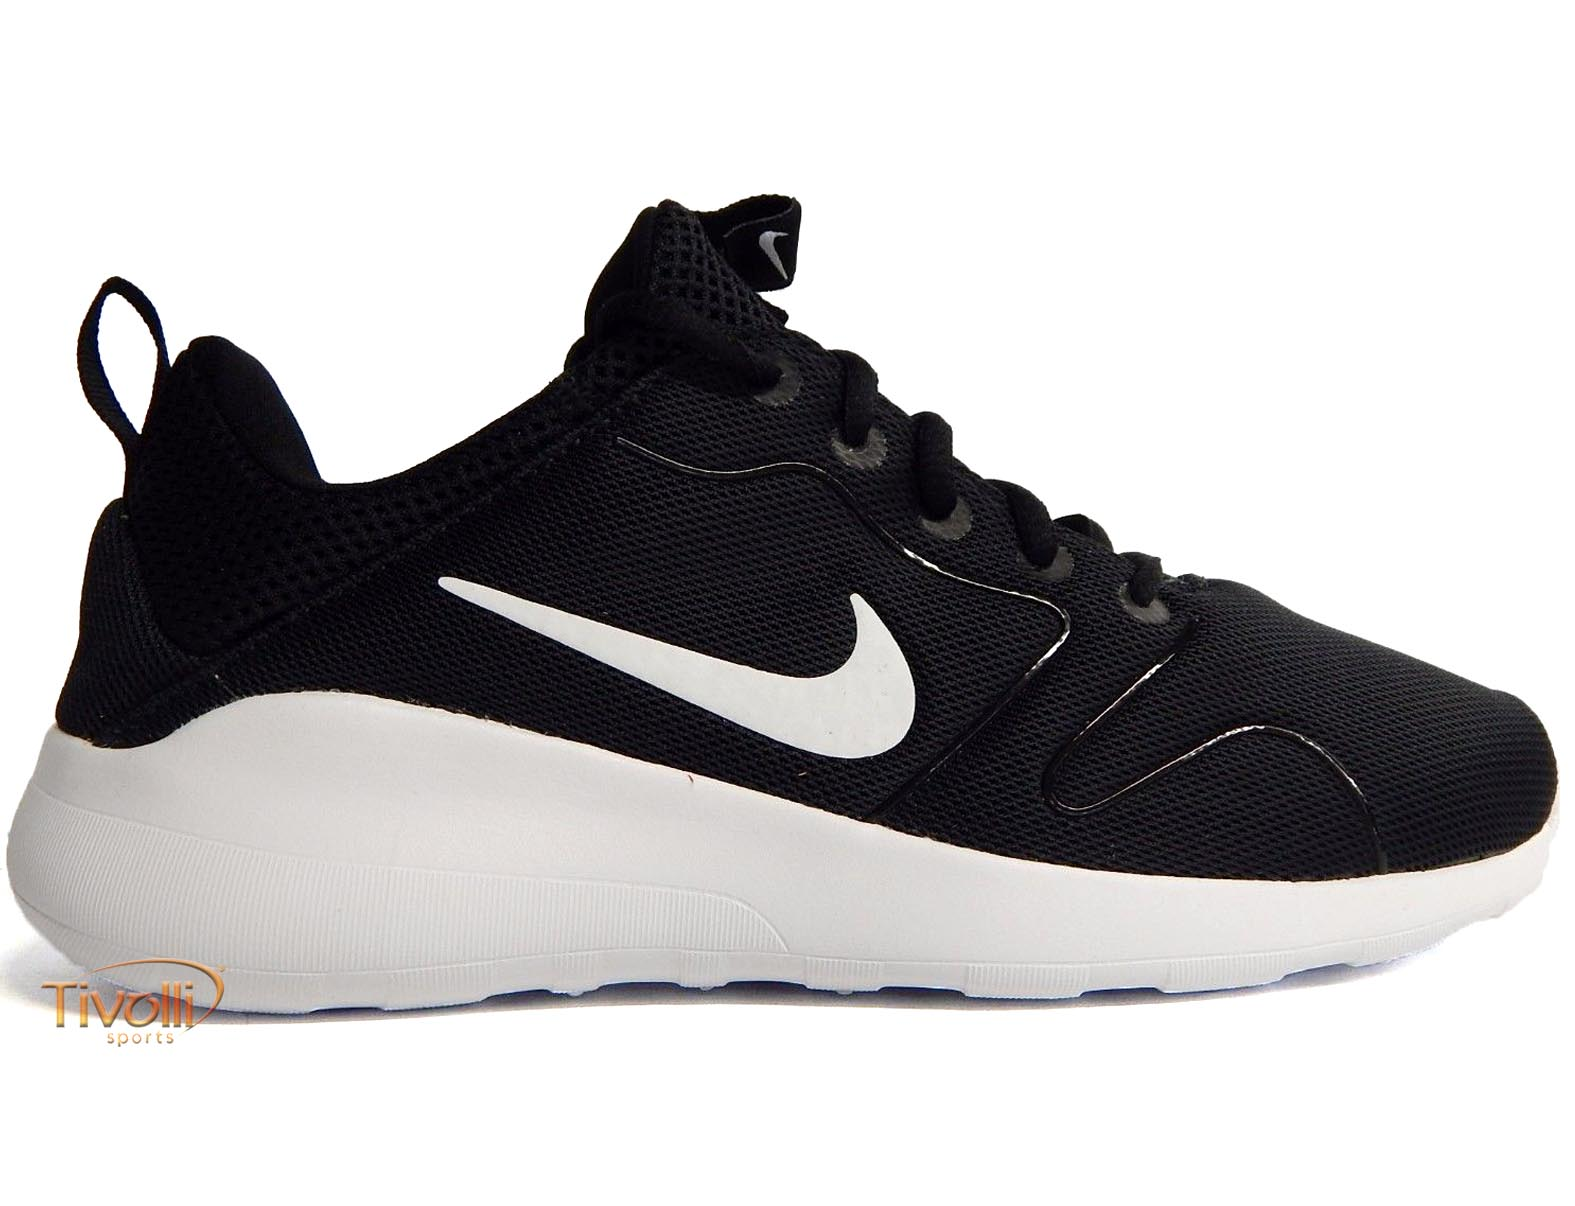 58424a7549 Raquete Mania   Tênis Nike Kaishi 2.0   preto e branco